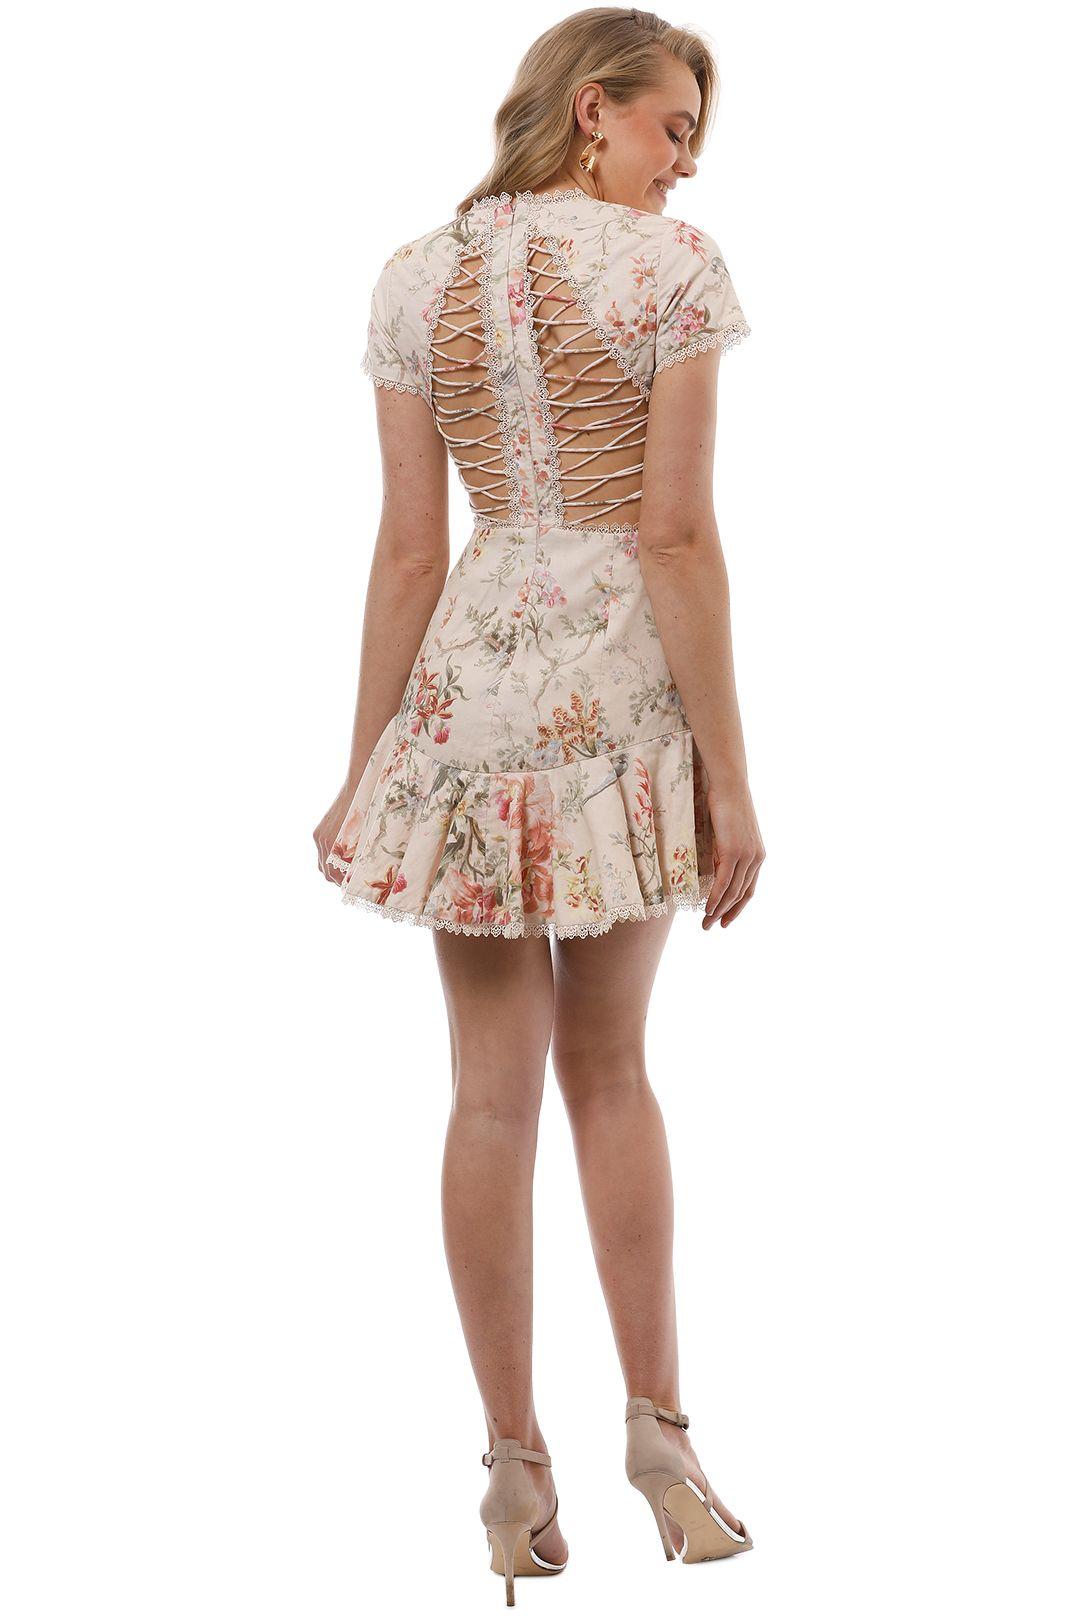 Zimmermann - Mercer Flutter Dress - Cream Floral - Back